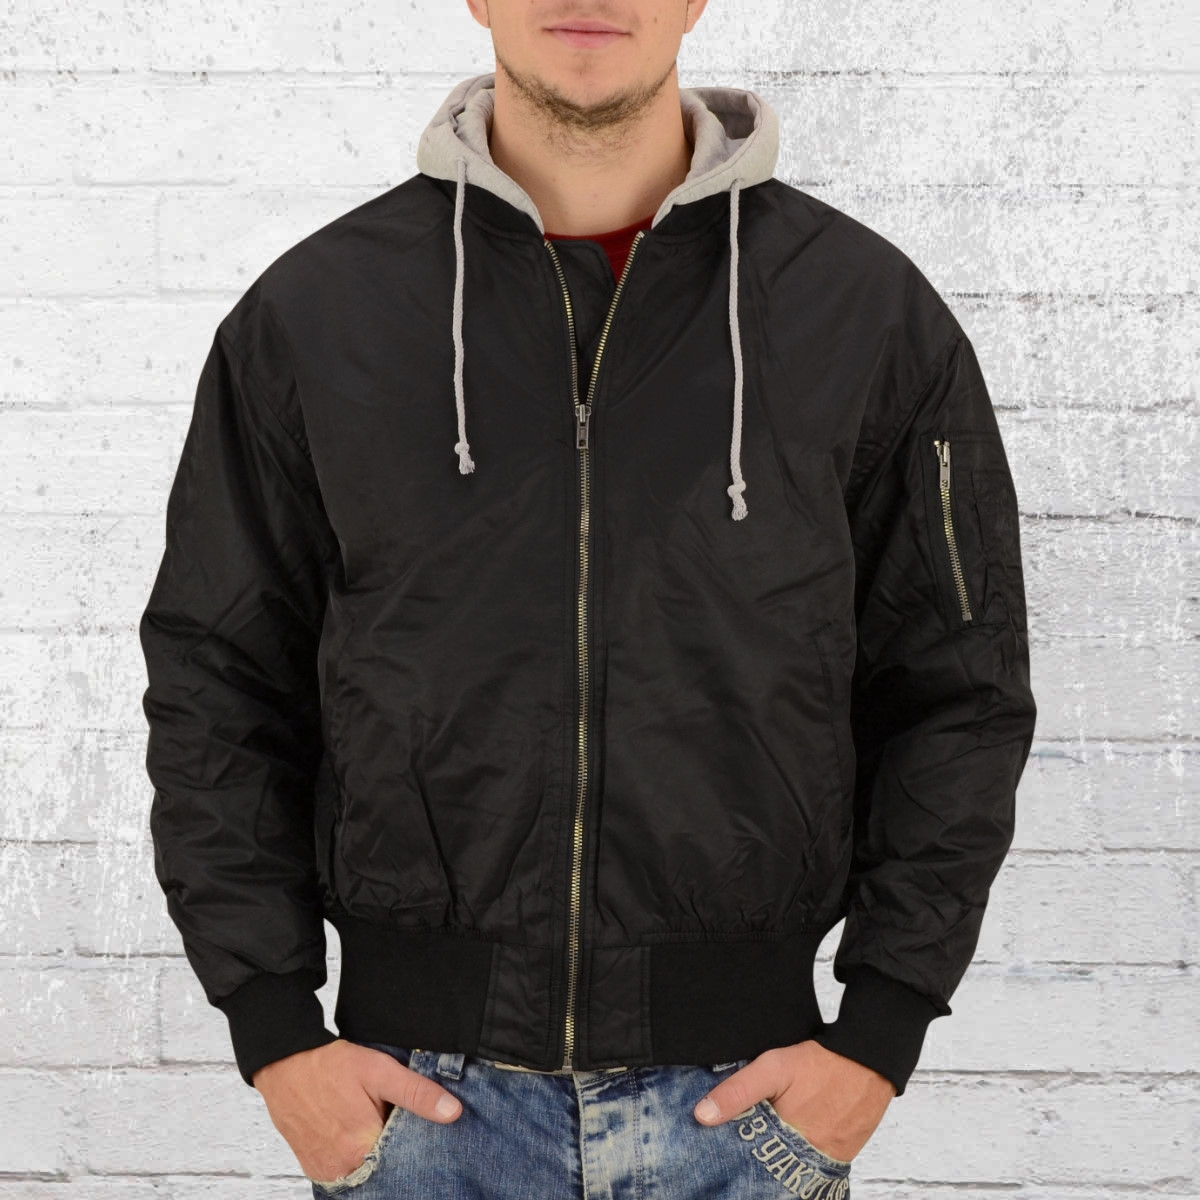 7d4af314e27c75 Order now | Urban Classics Hooded Oversized Bomber Jacket black